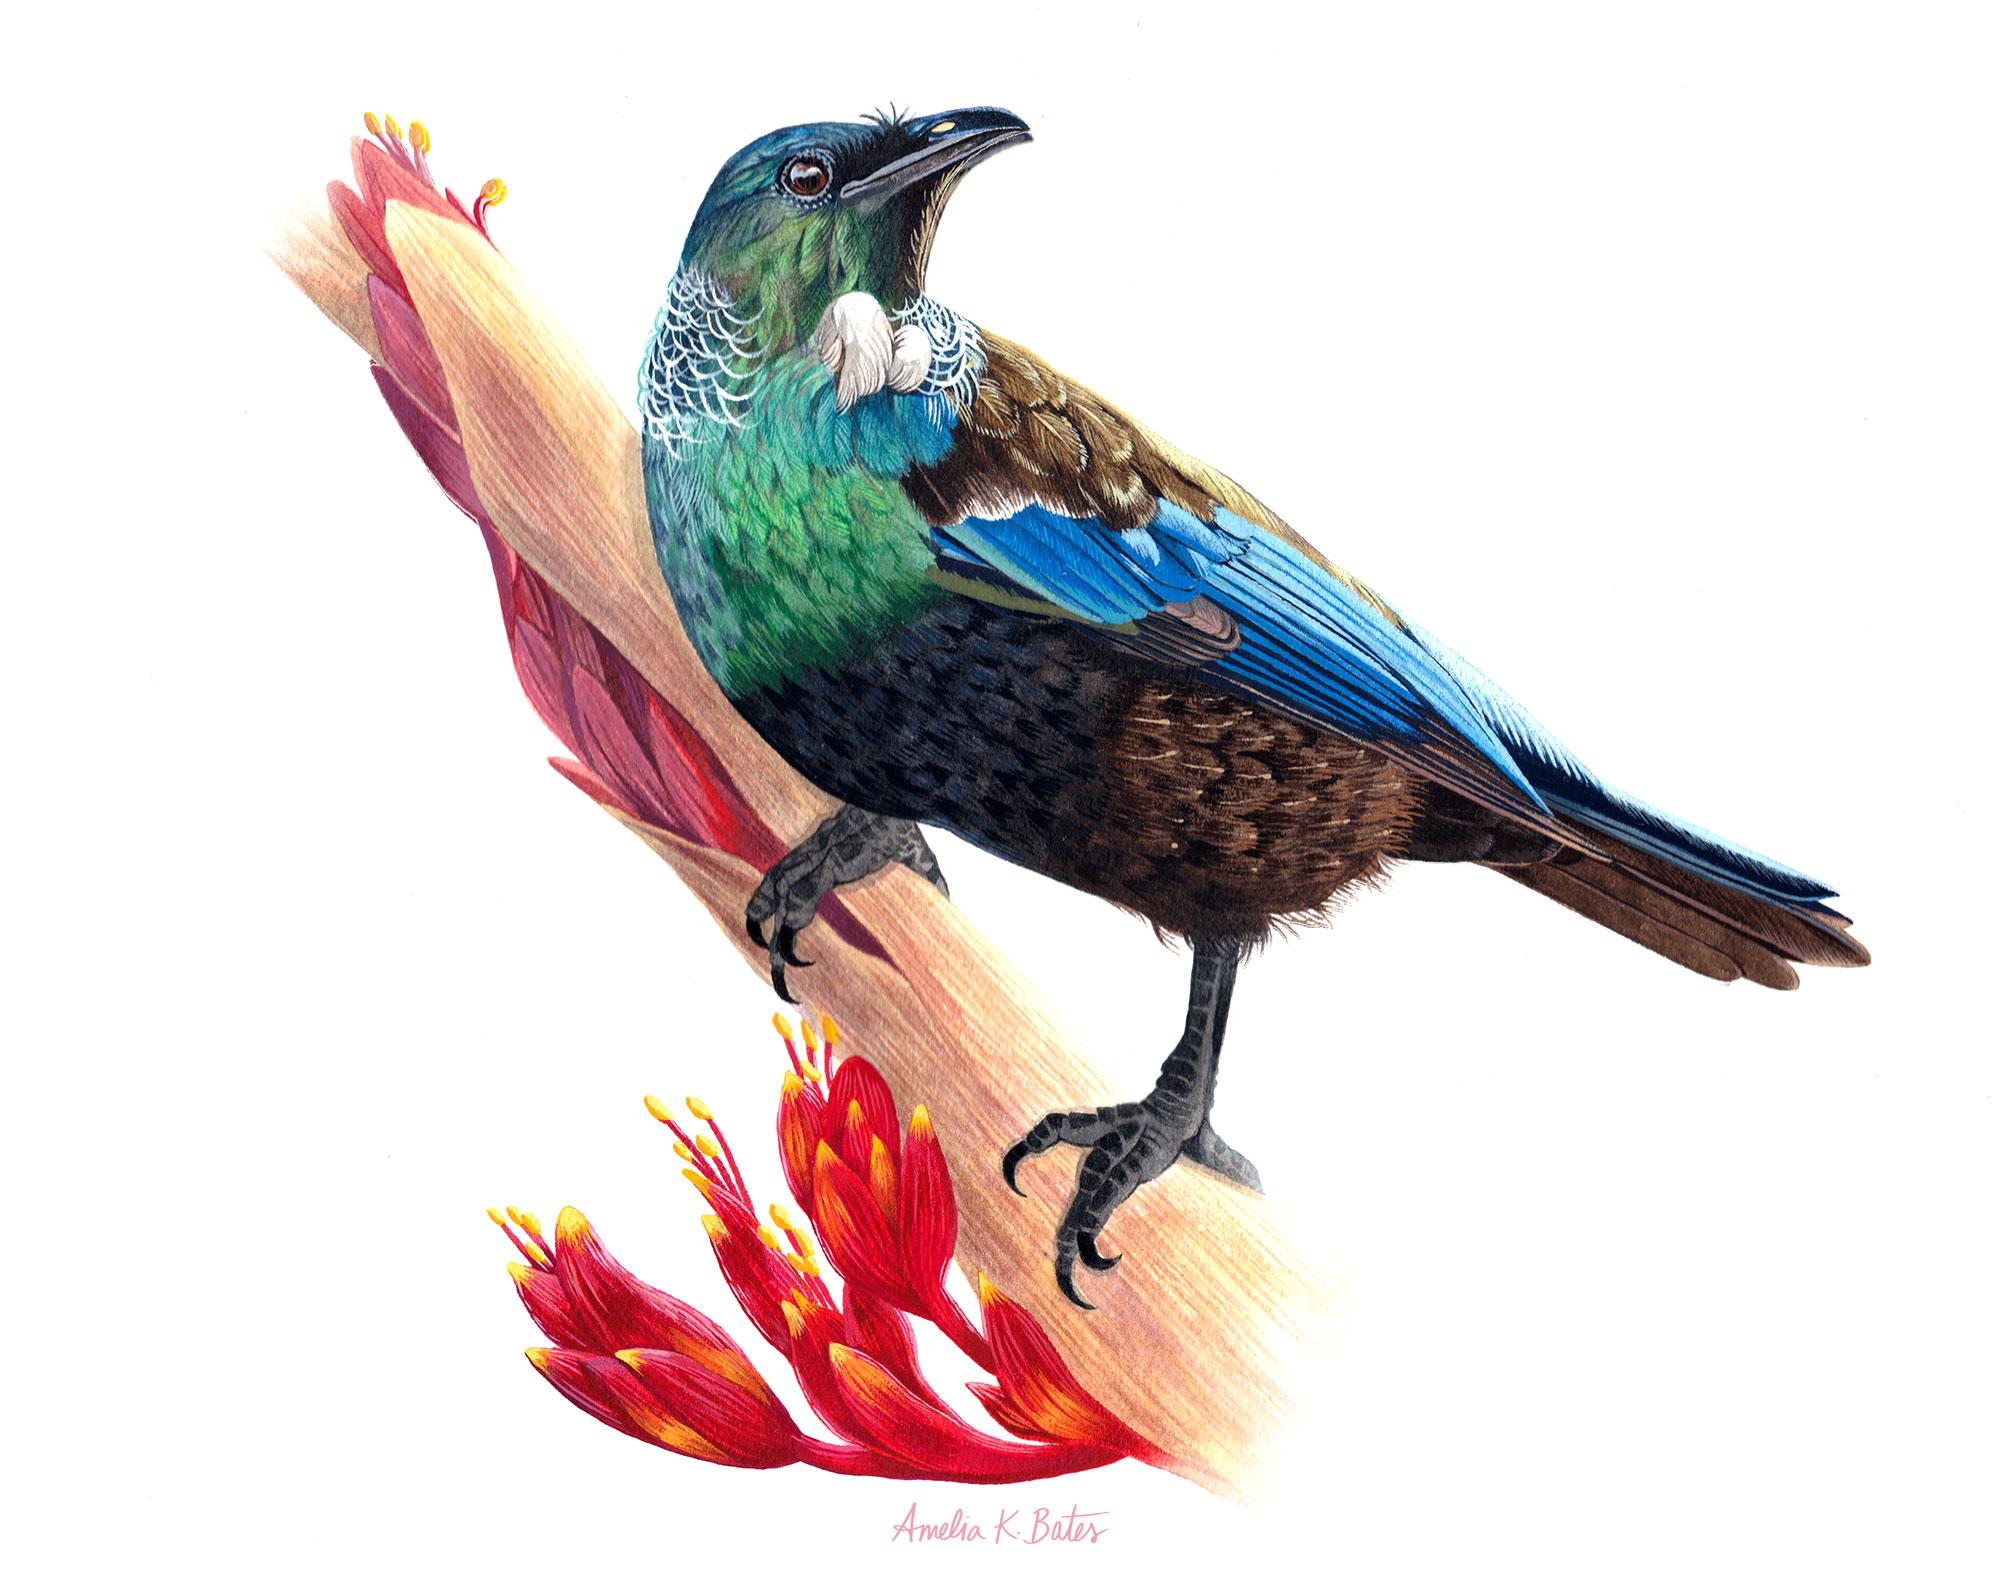 Tui (Prosthemadera novaeseelandiae), watercolor and gouache on Arches cold press watercolor paper